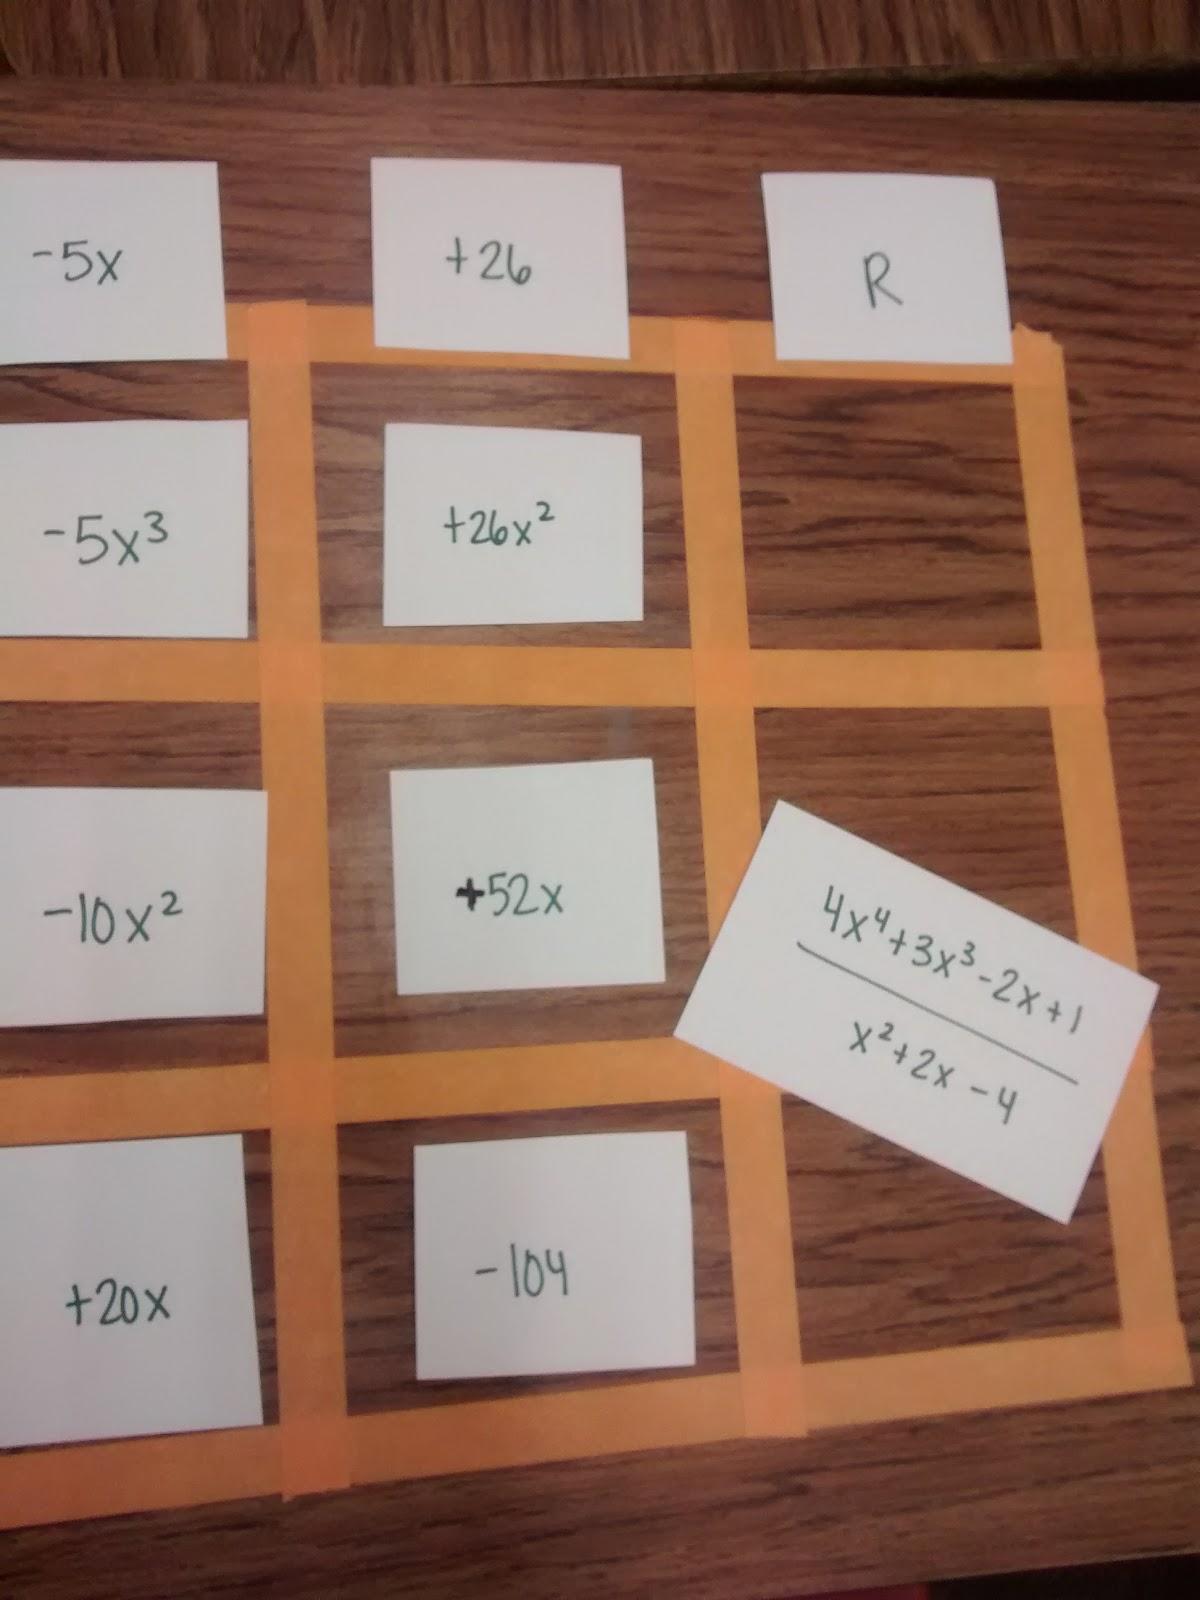 Multiplying and dividing polynomials worksheet kuta software